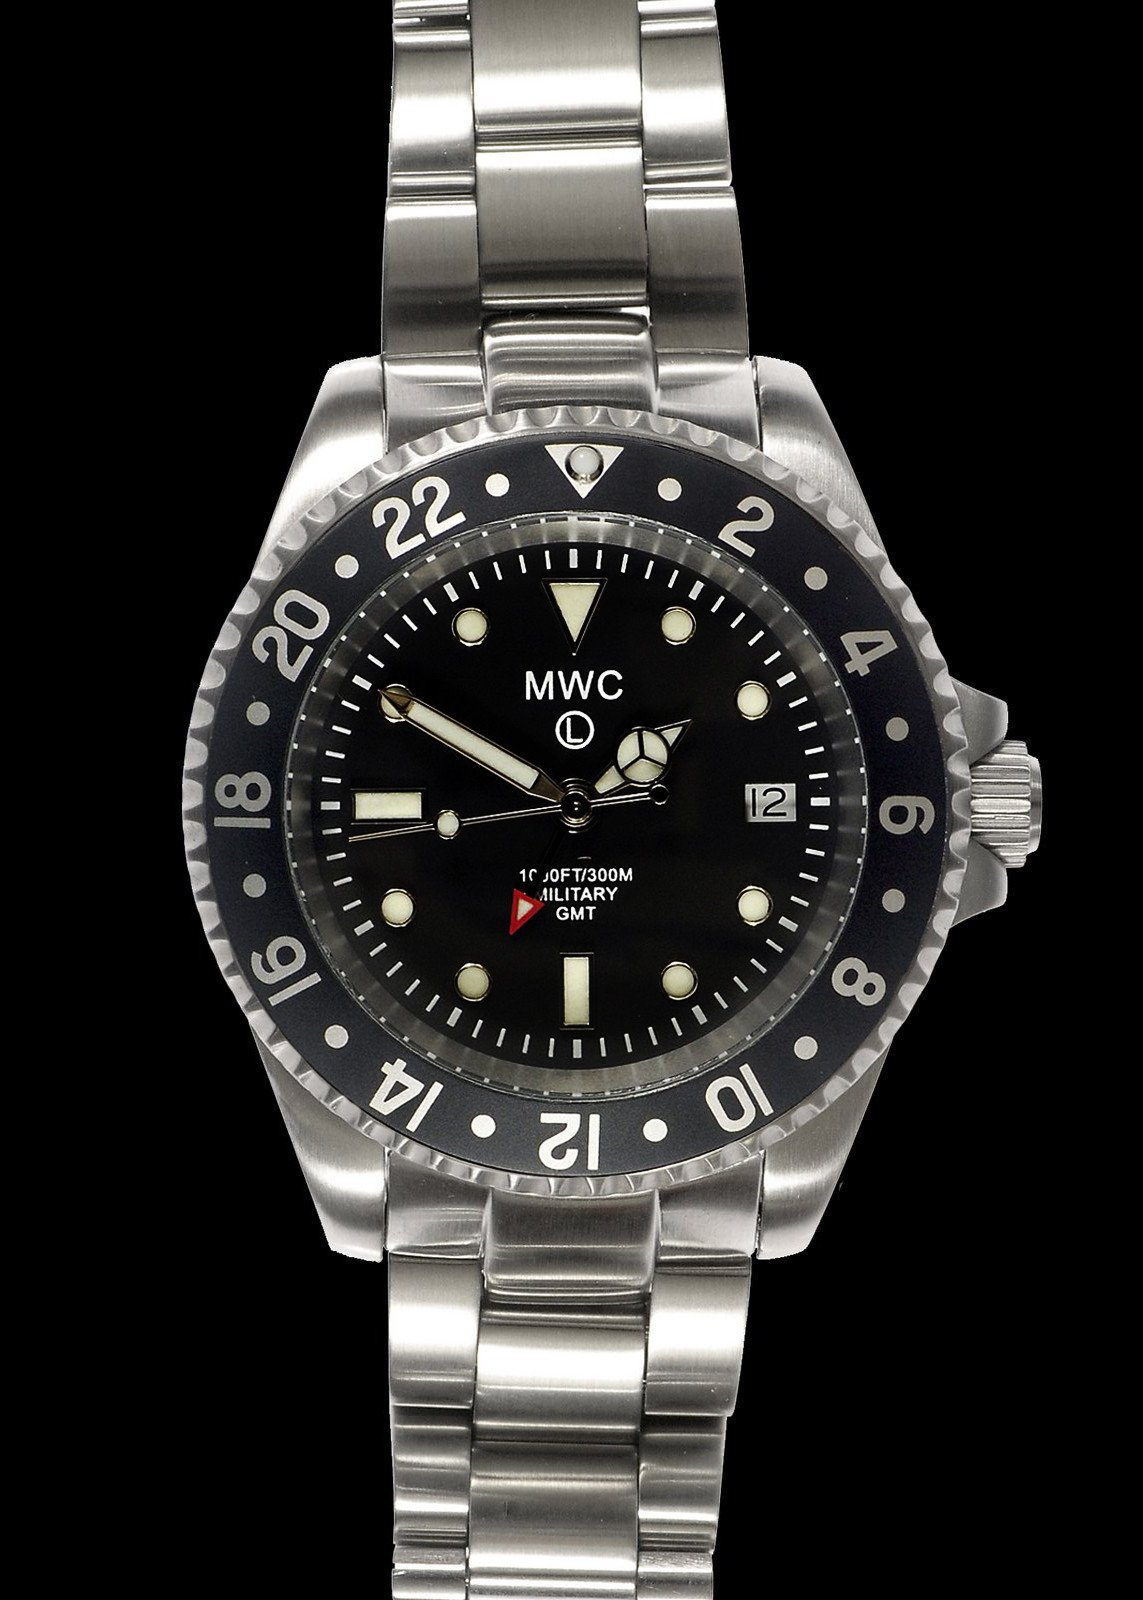 Водолазен часовник MWC GMT Dual Timezone 300m Quartz Military – MWC